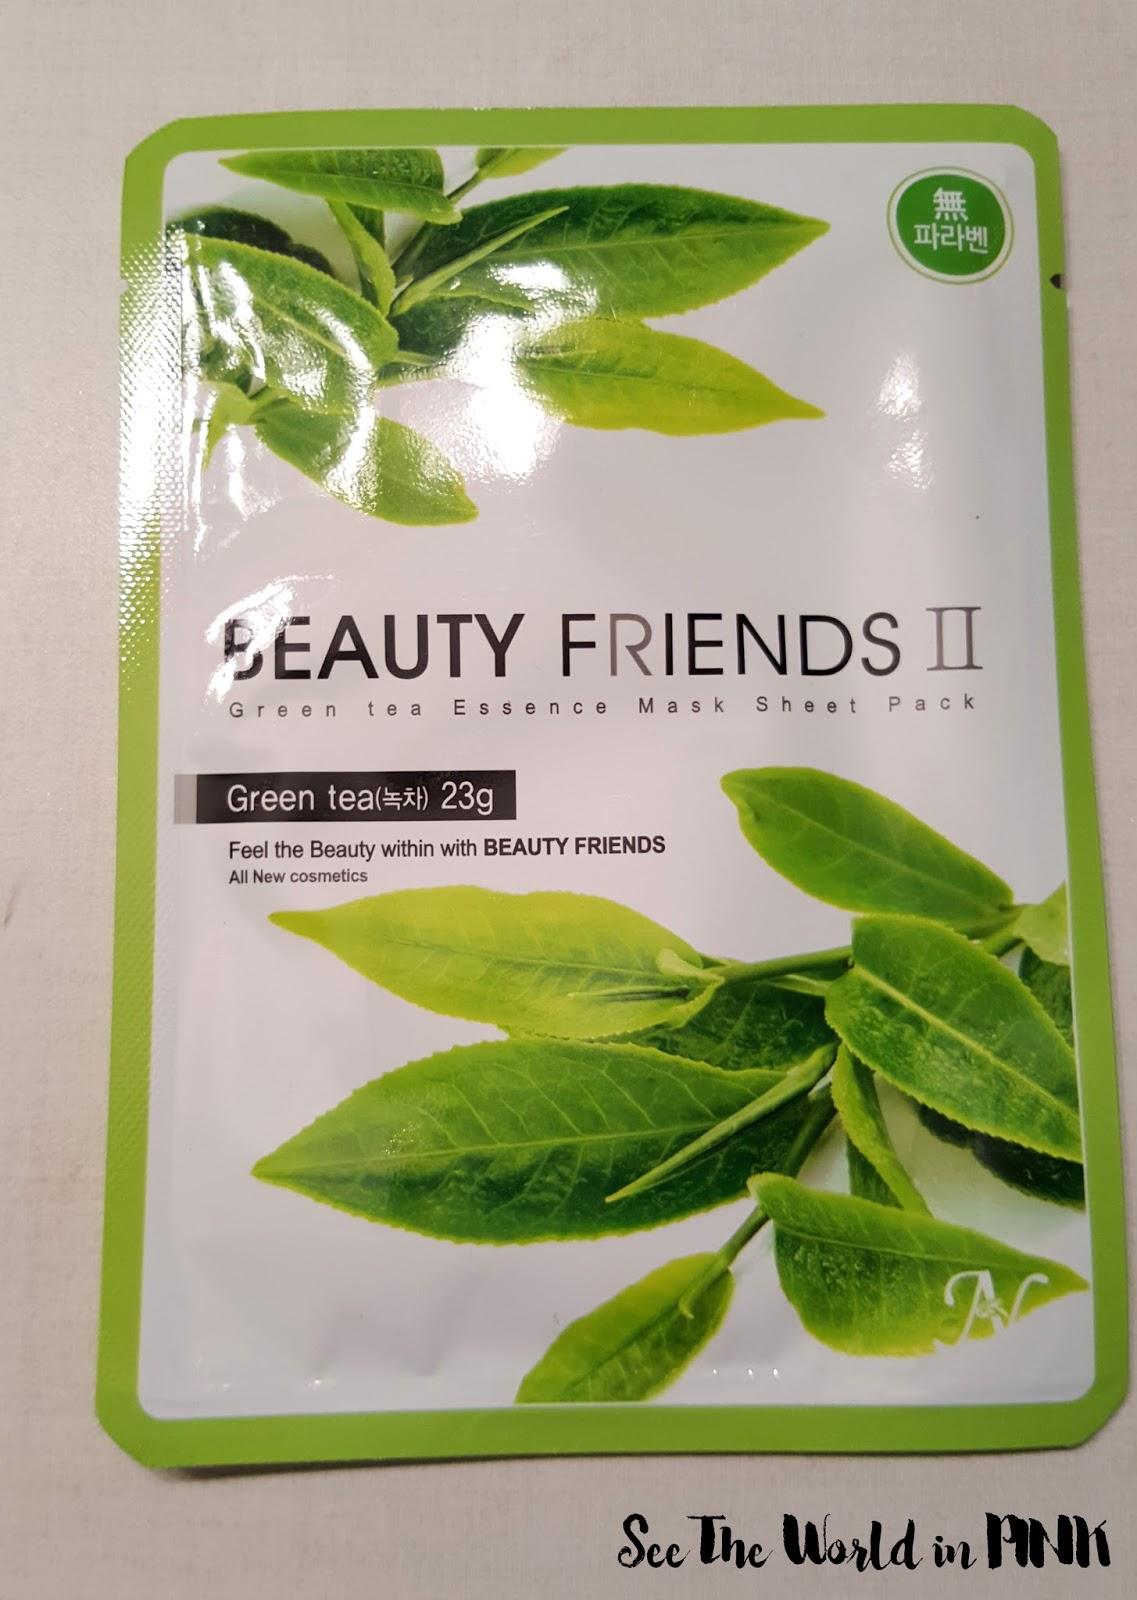 Beauty Friends II Essence Mask Sheet Pack (Green Tea)